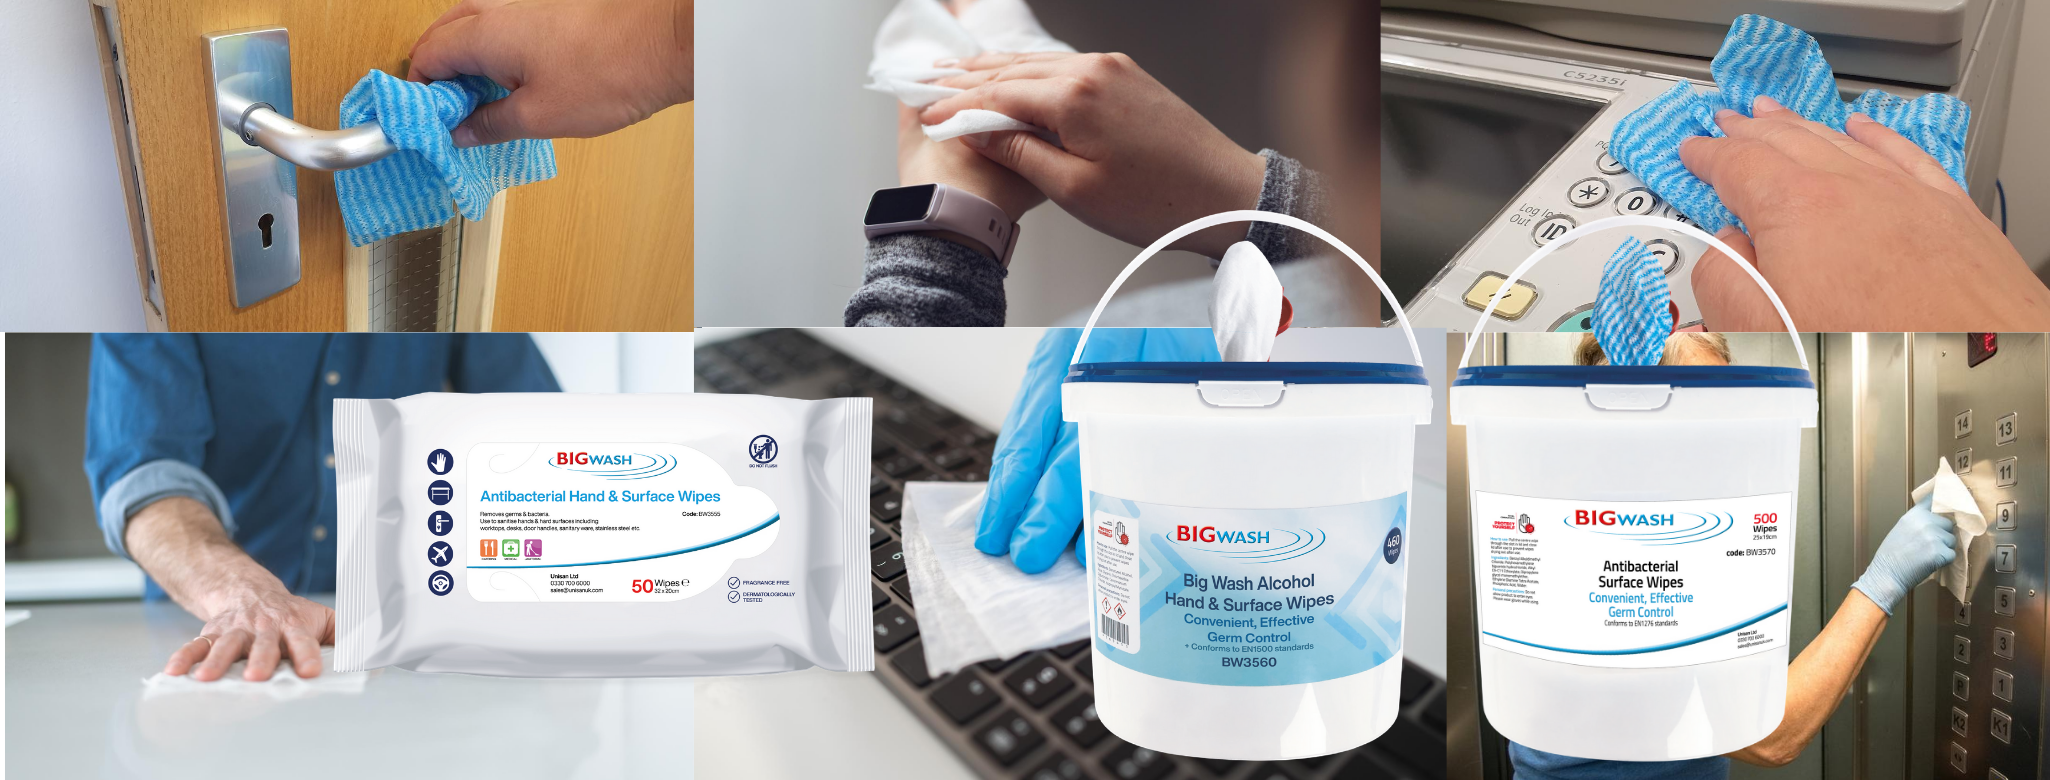 antibacterial sanitiser wipes